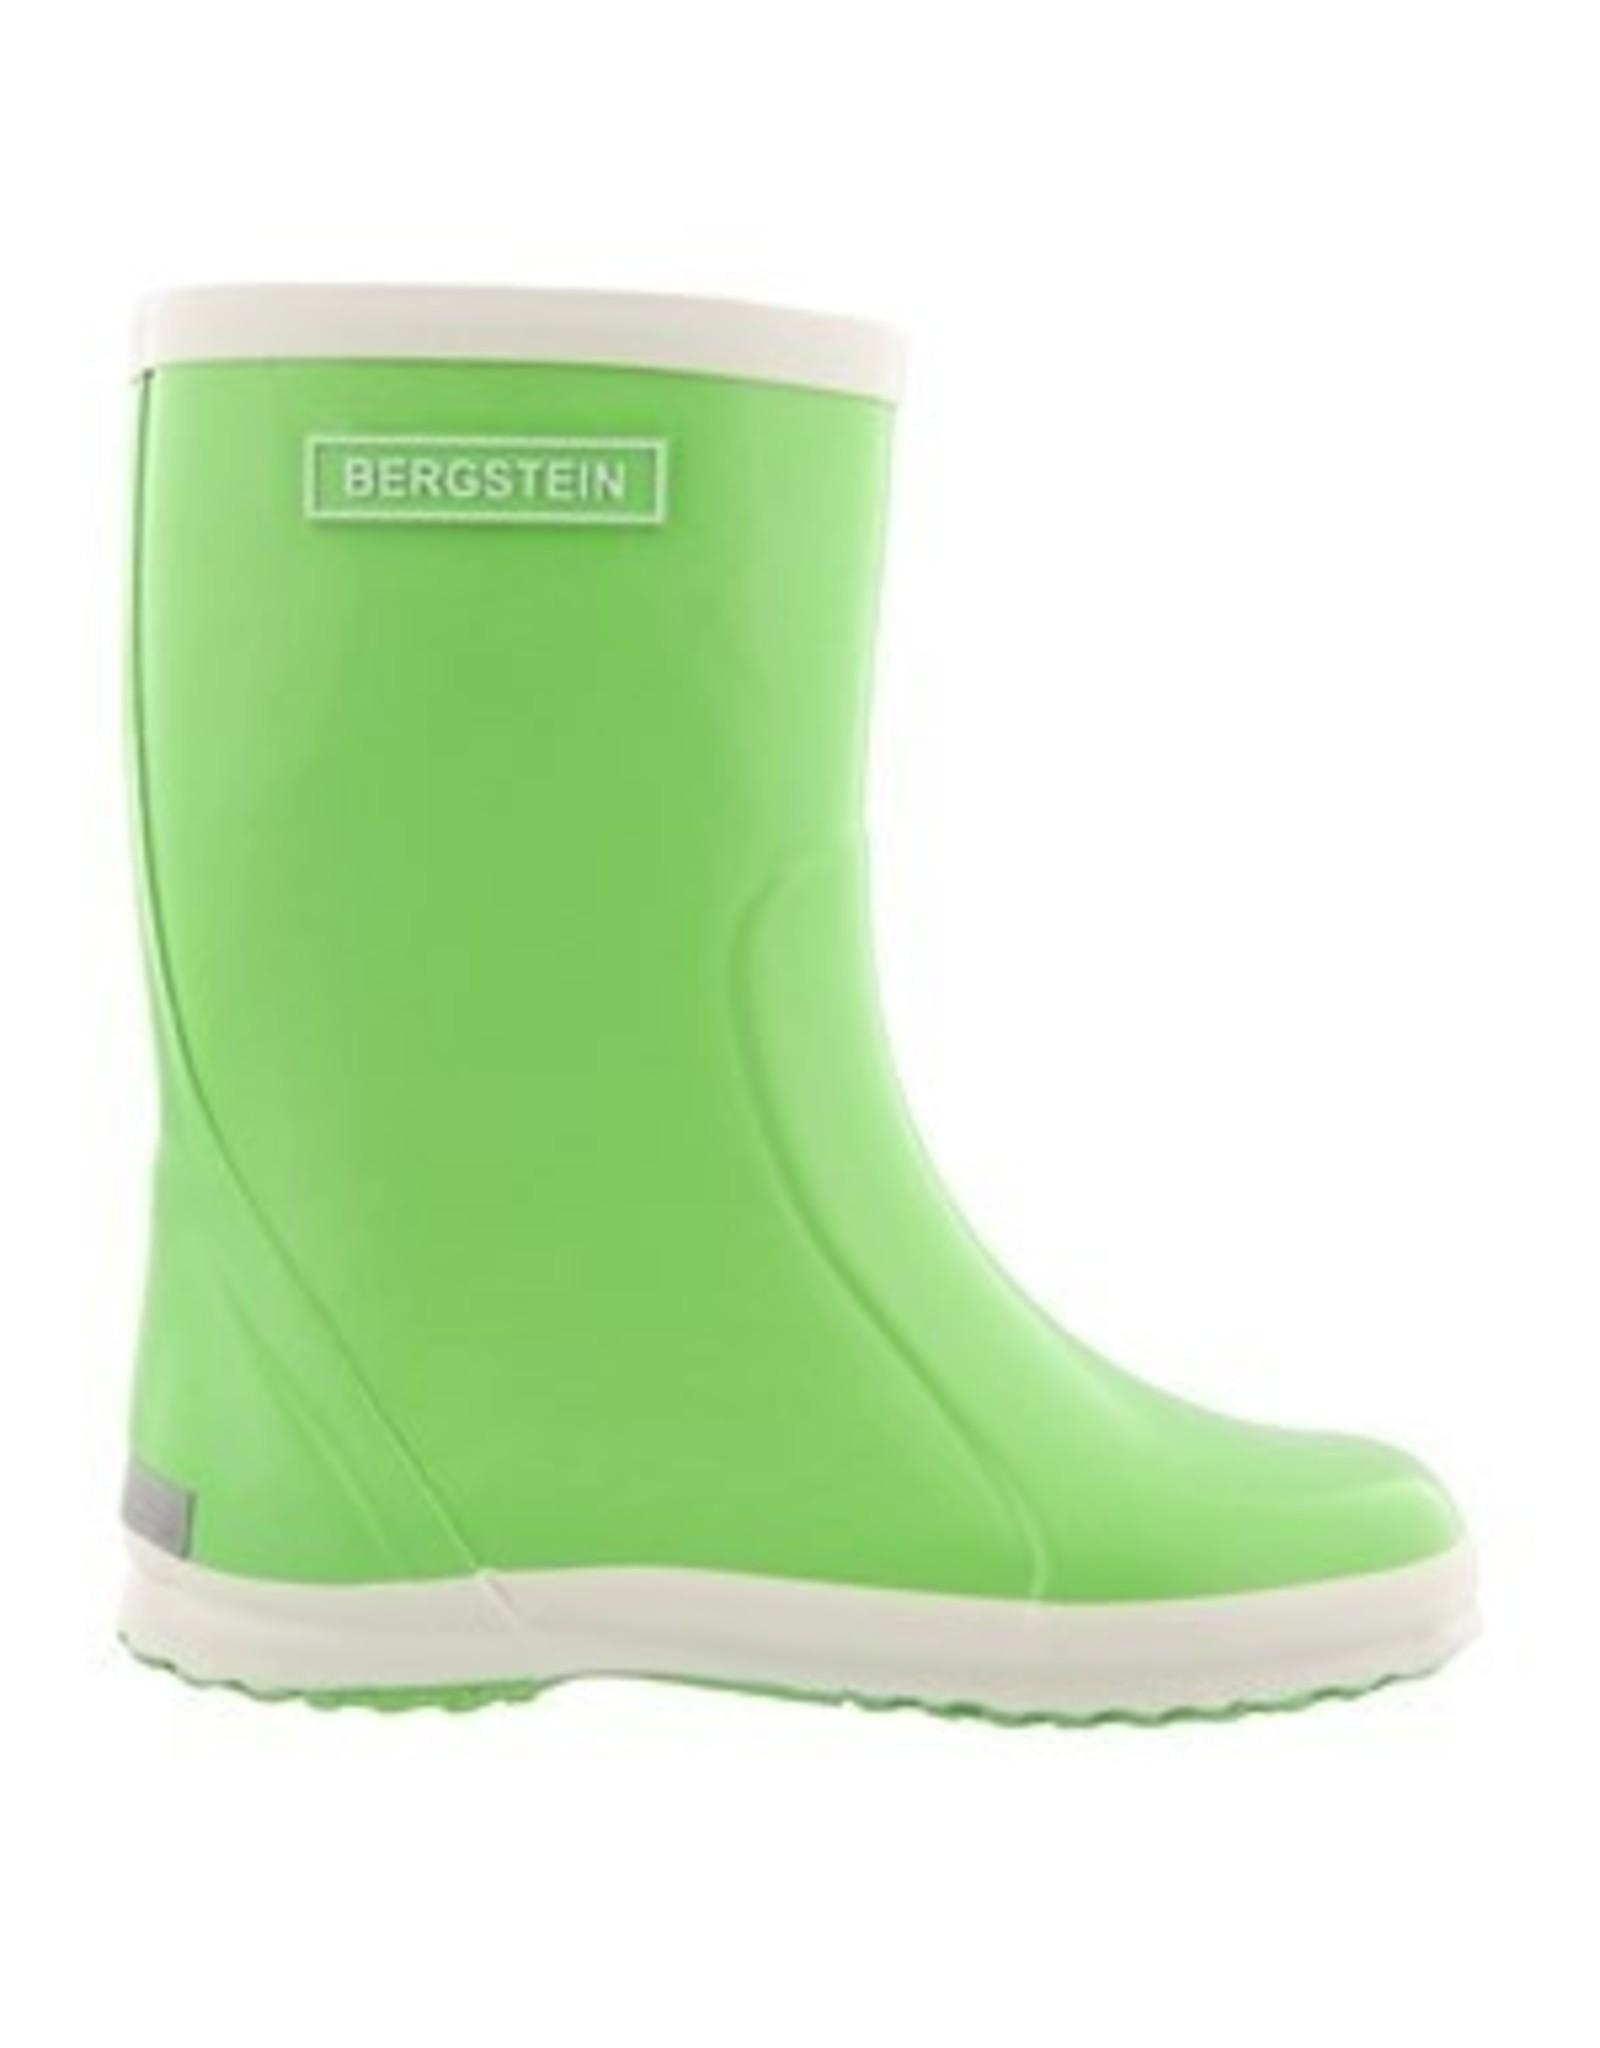 Bergstein Rain boot lime green